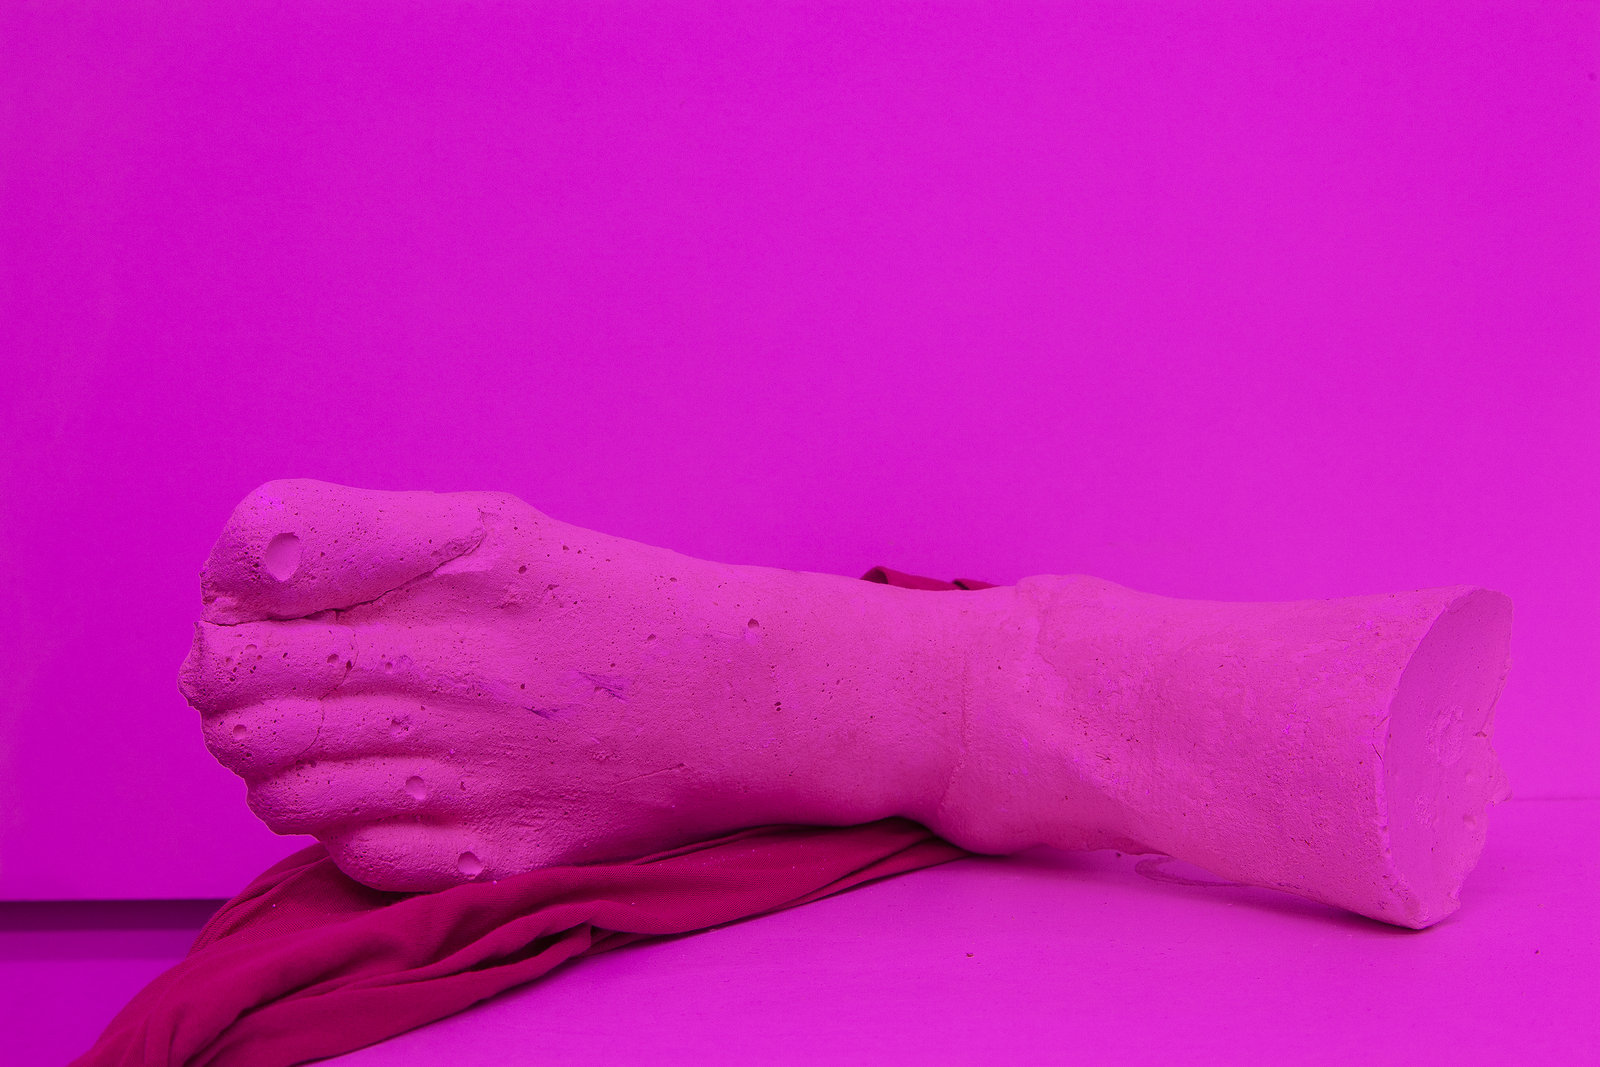 18 - 'De gustibus et coloribus non disputandum' by Horrible Bise at Deborah Bowmann